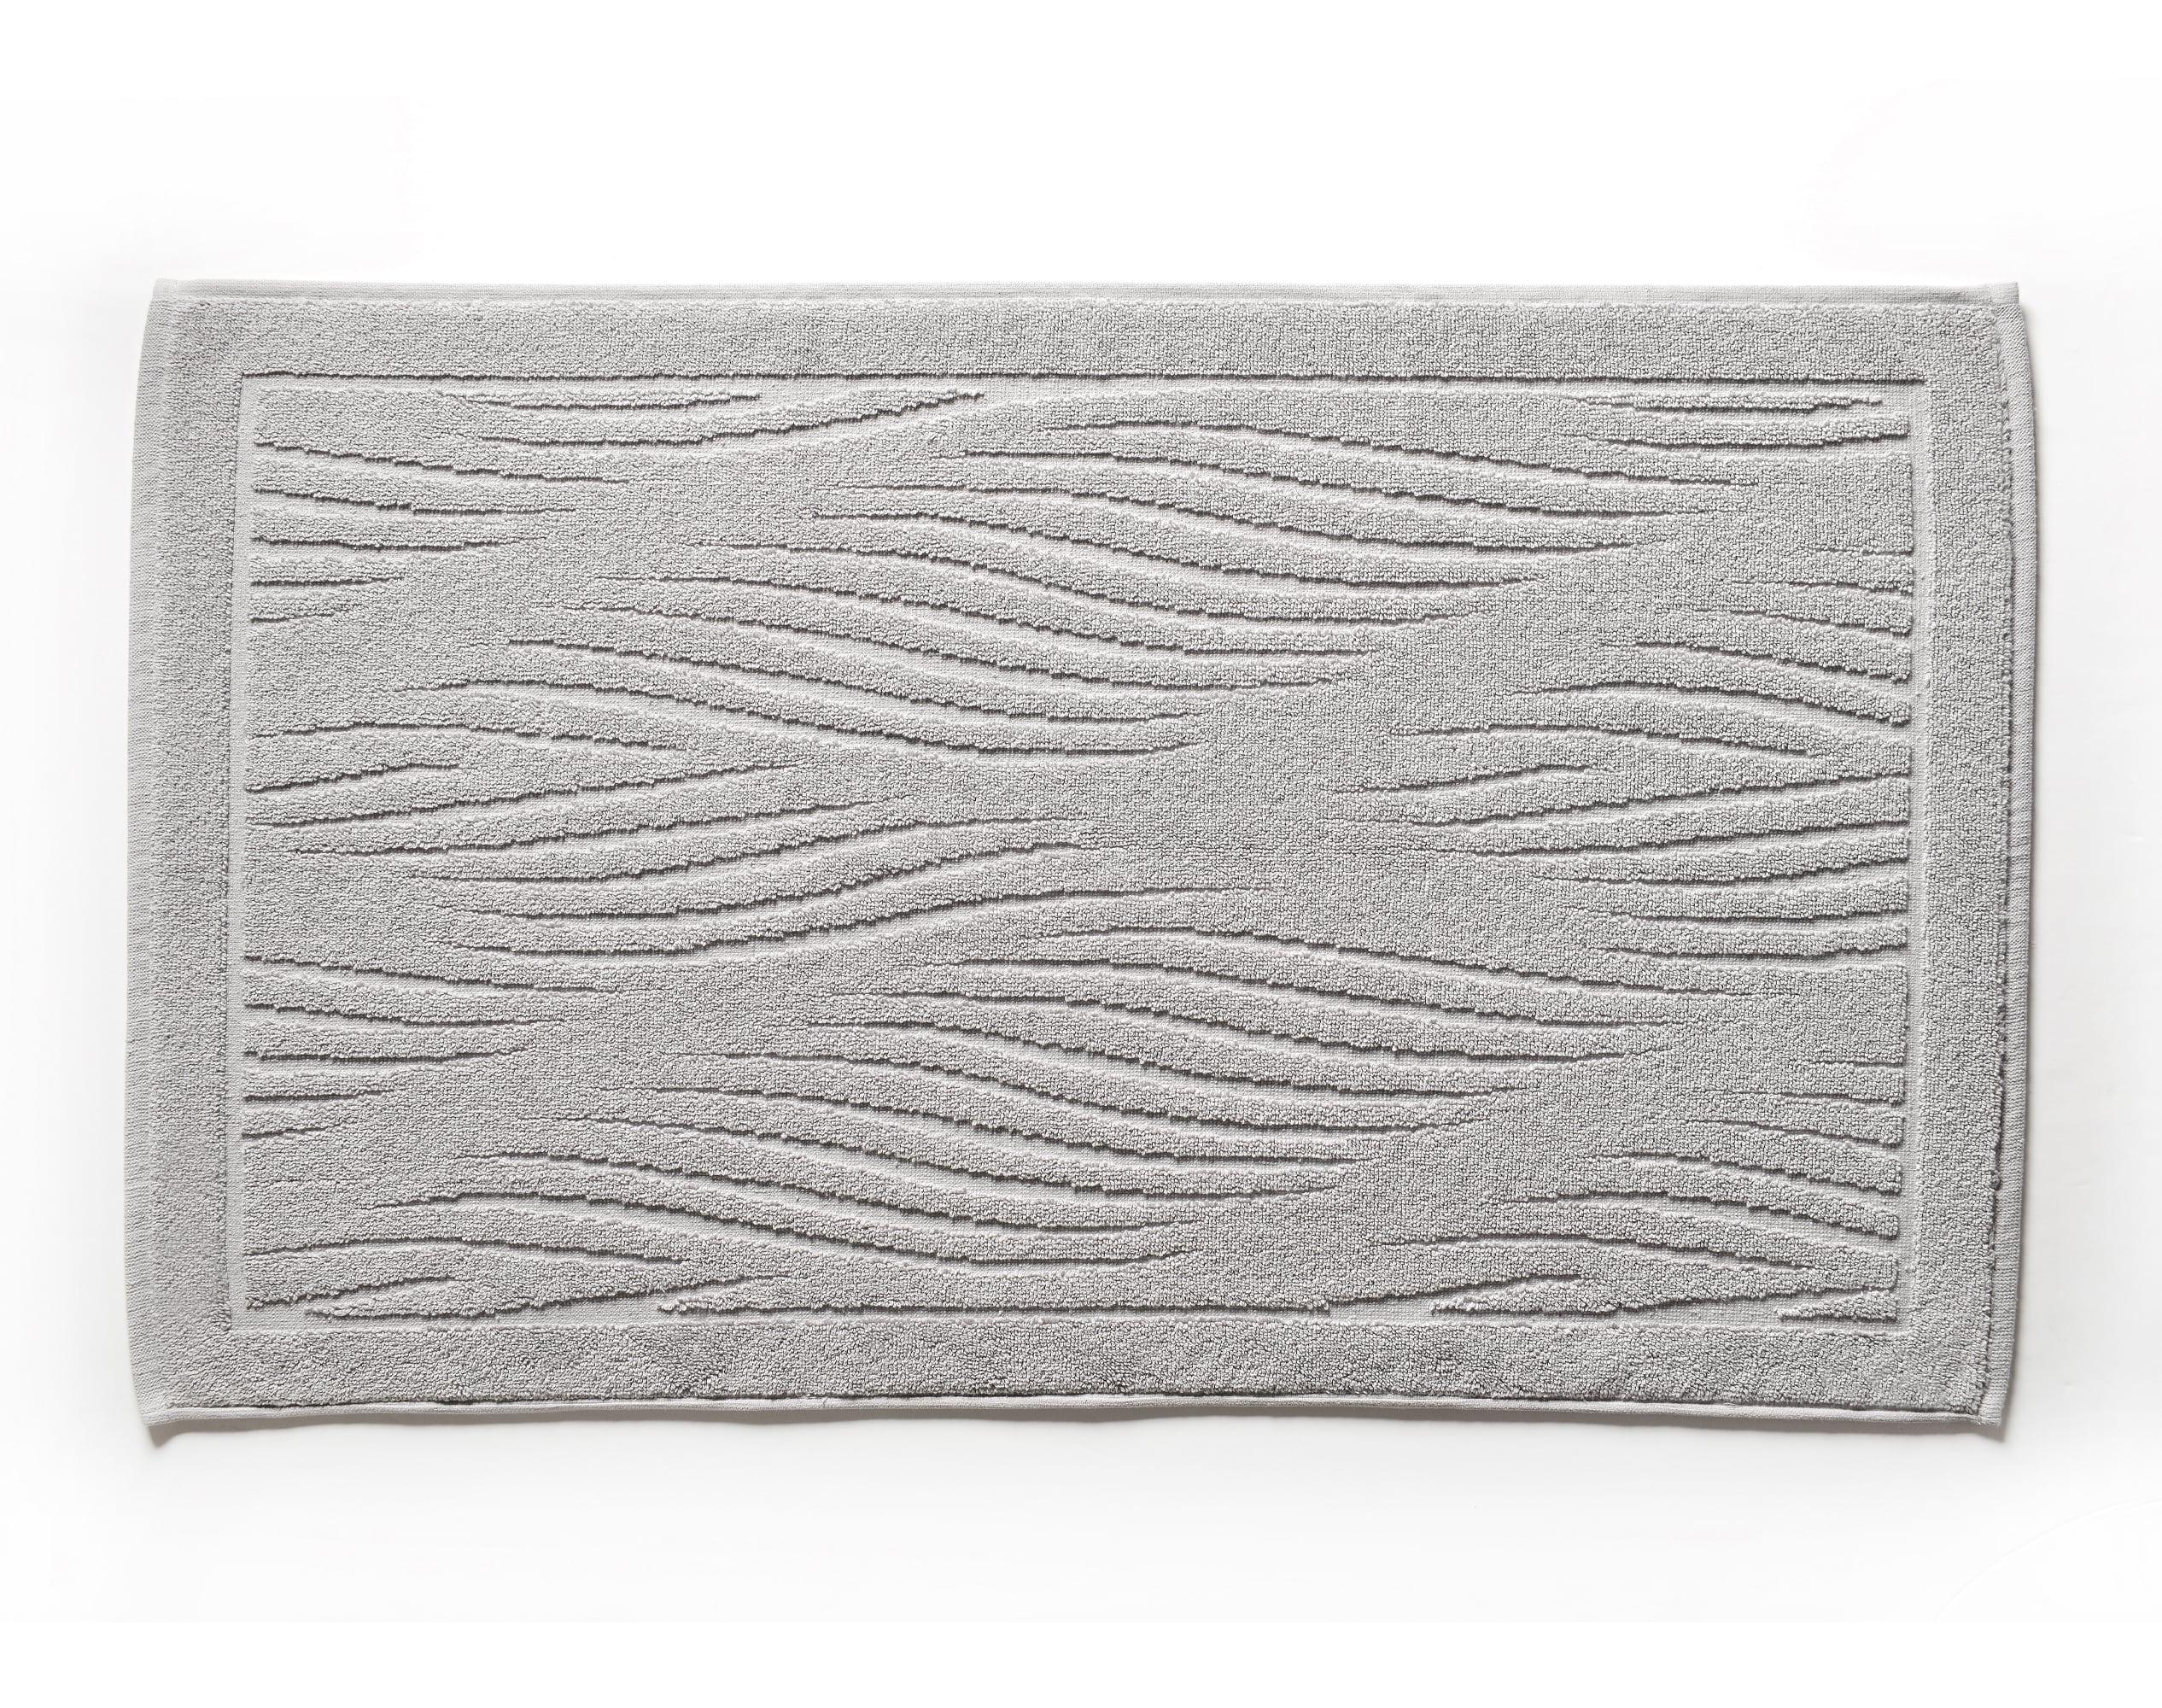 Tapis de bain gris perle 80x50 en coton